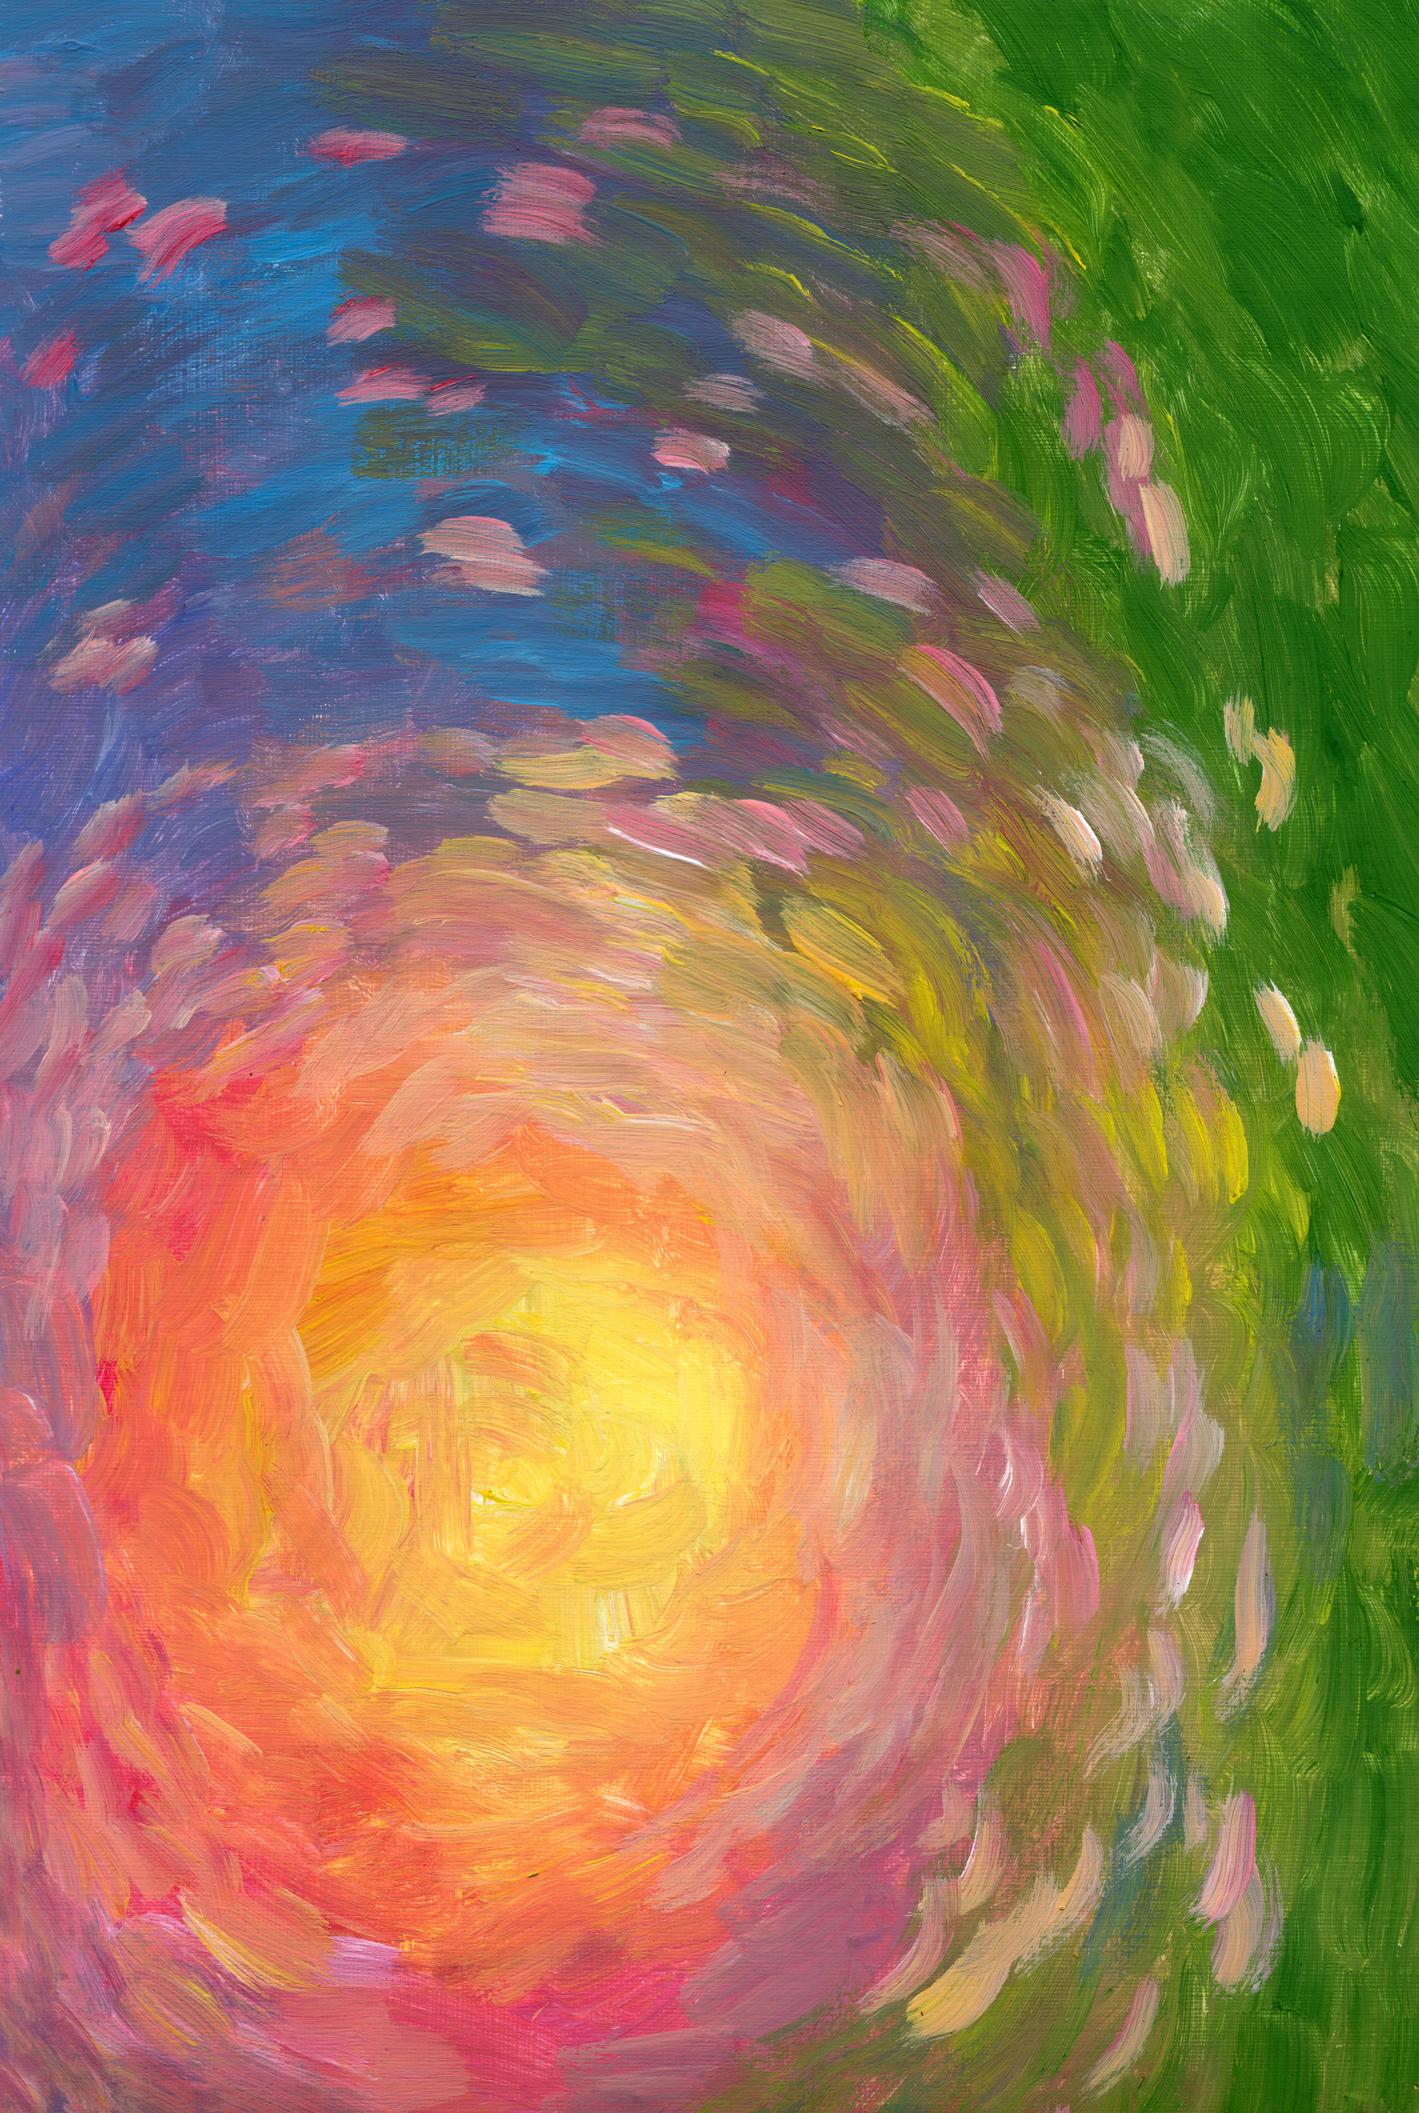 Summer-sun-oil-painting,-impressionism-697576724_2116x1421.jpeg